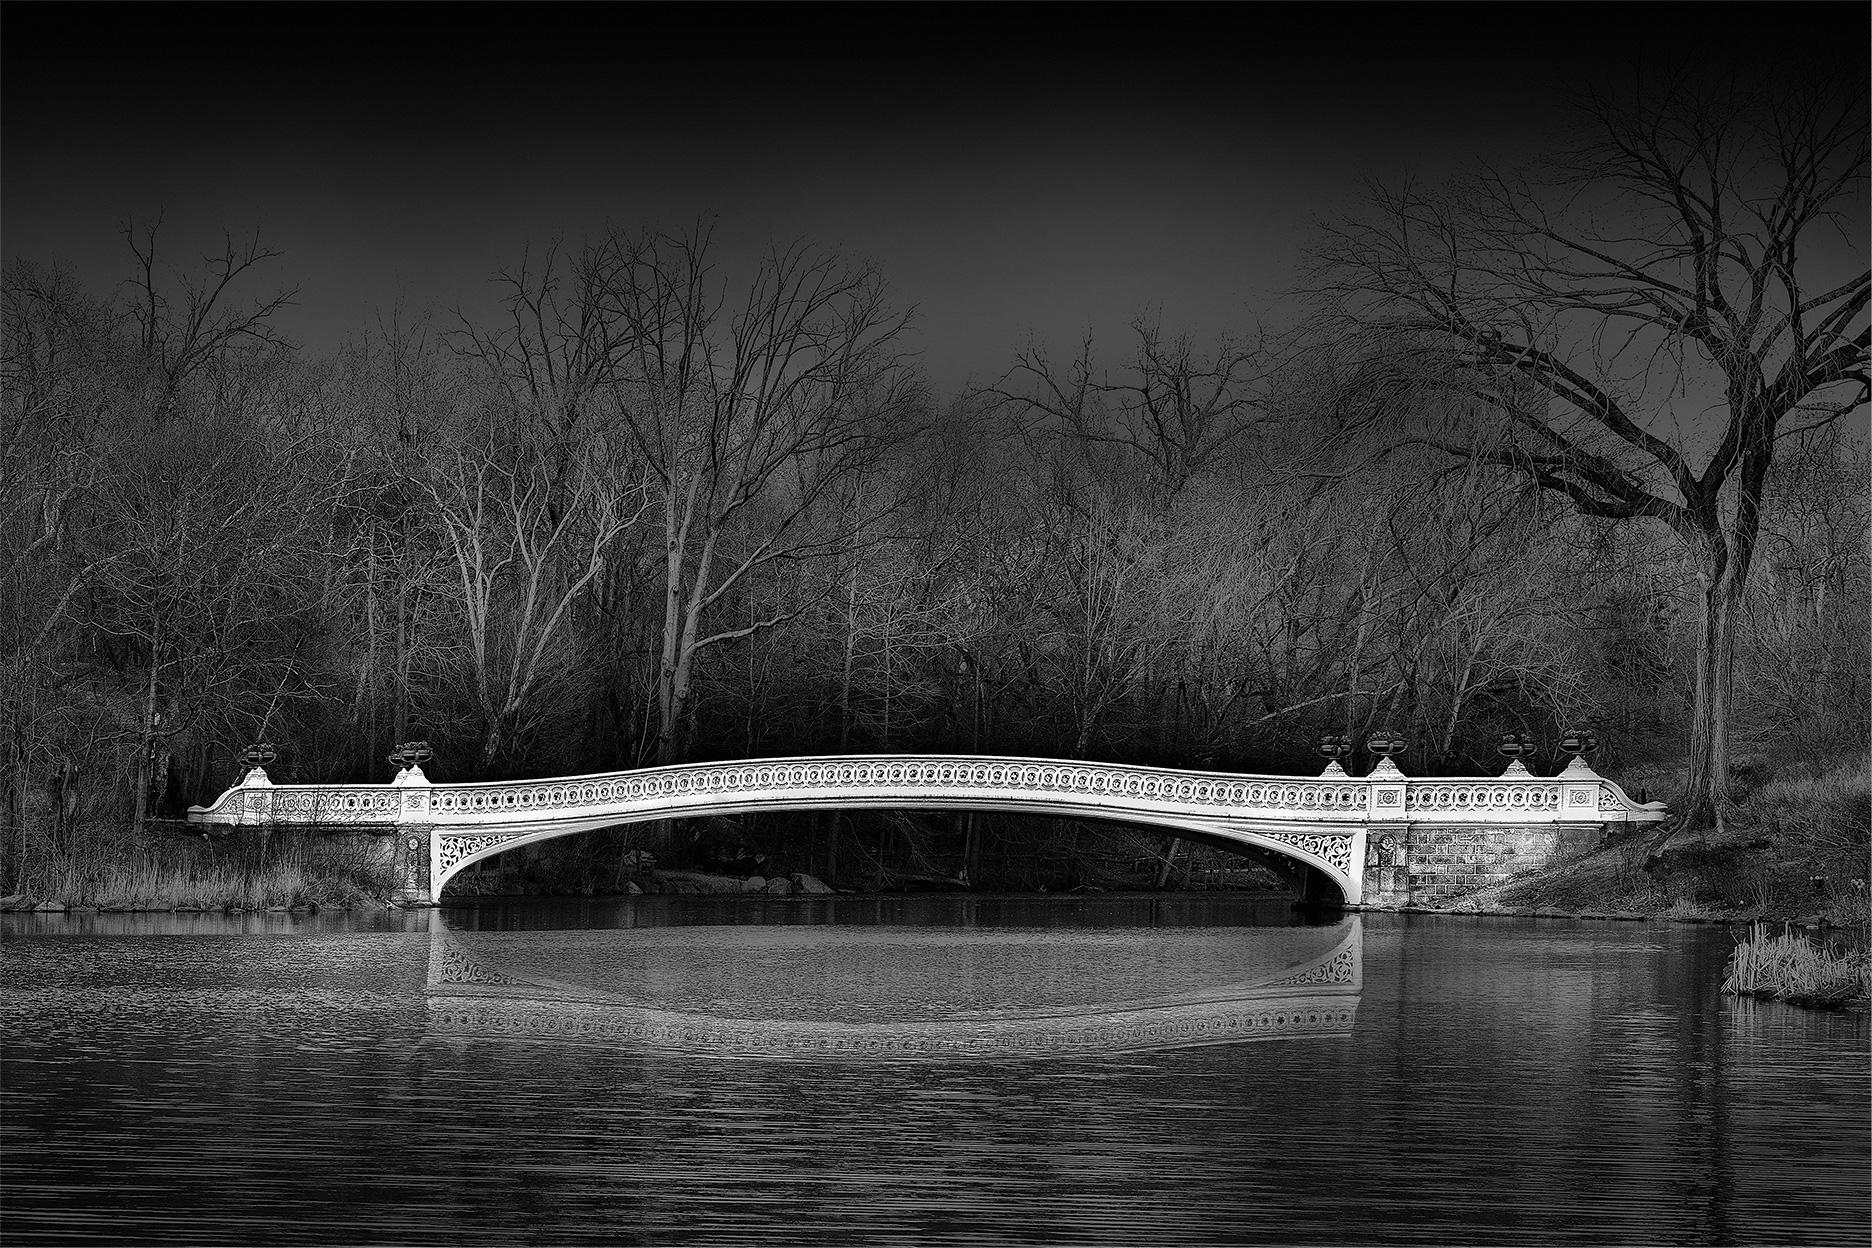 The Bow Bridge, Central Park, NYC